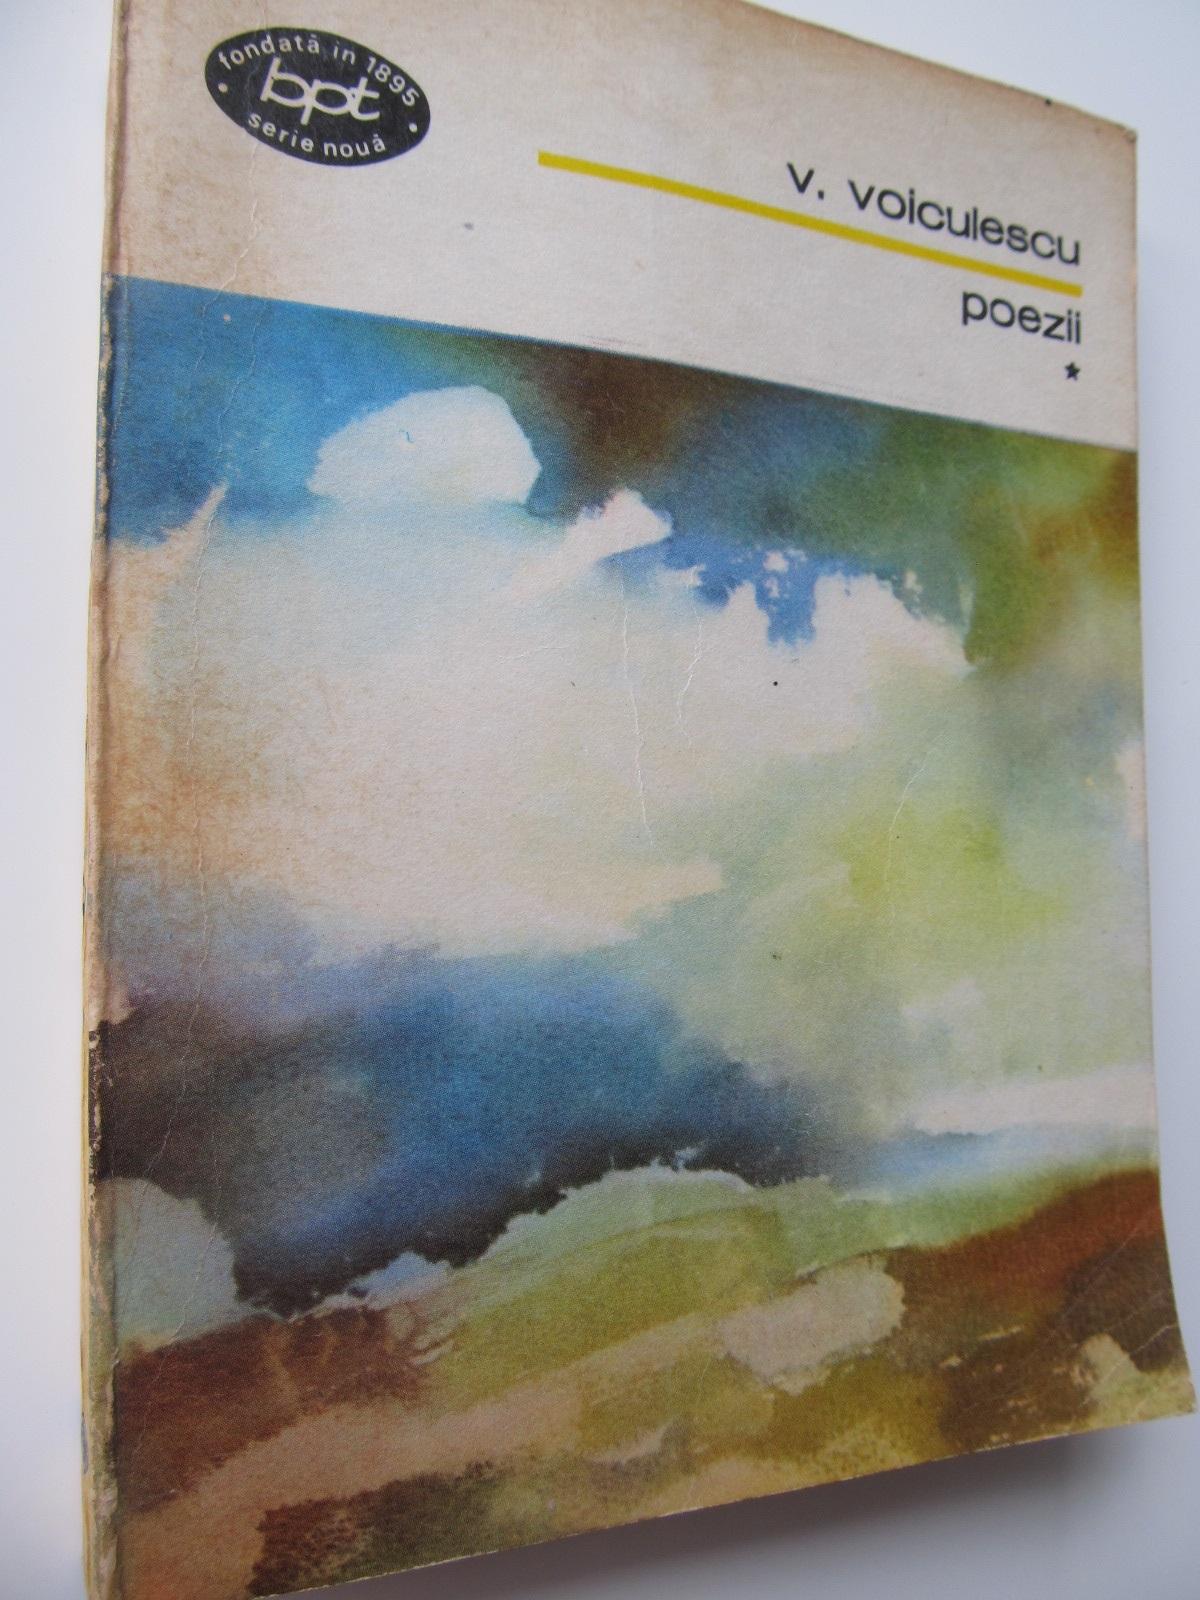 Poezii (vol. 1) - V. Voiculescu | Detalii carte